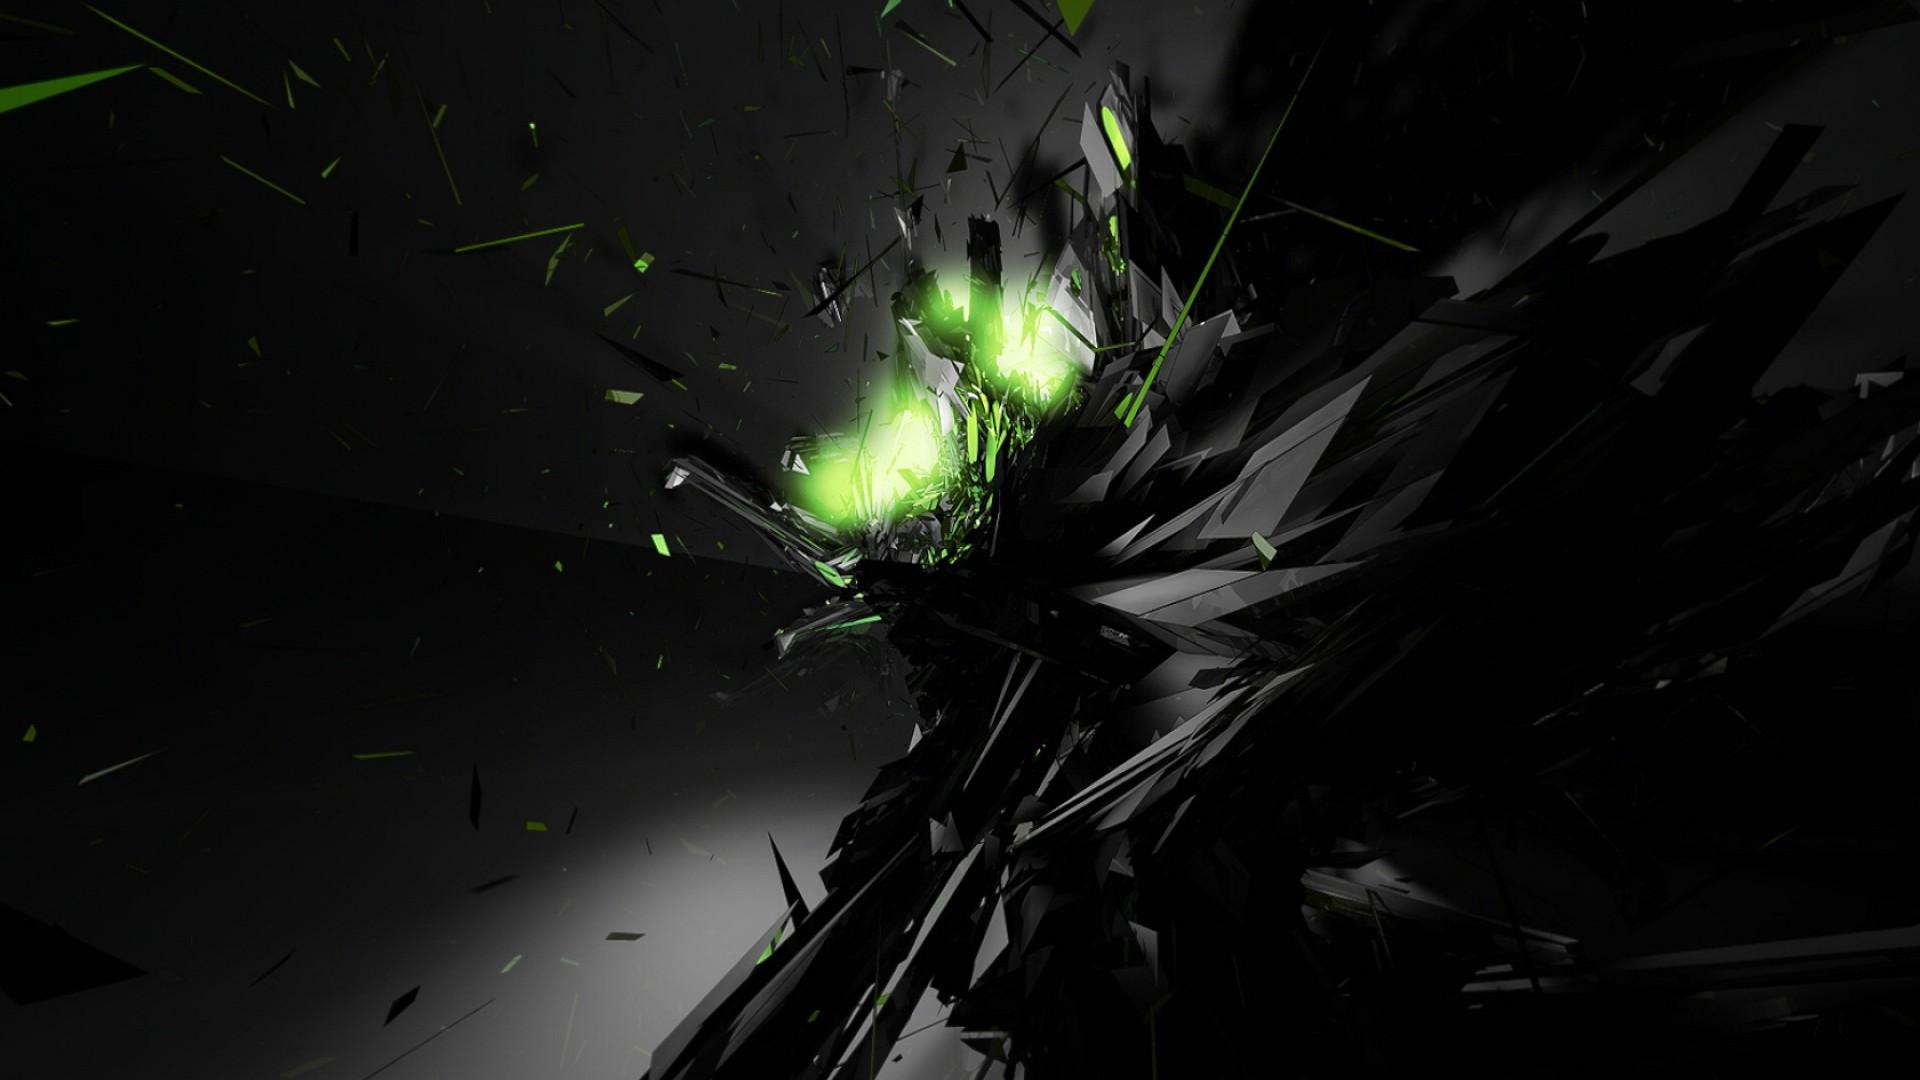 desktop wallpaper green abstract black wallpapers 1920x1080 1920x1080